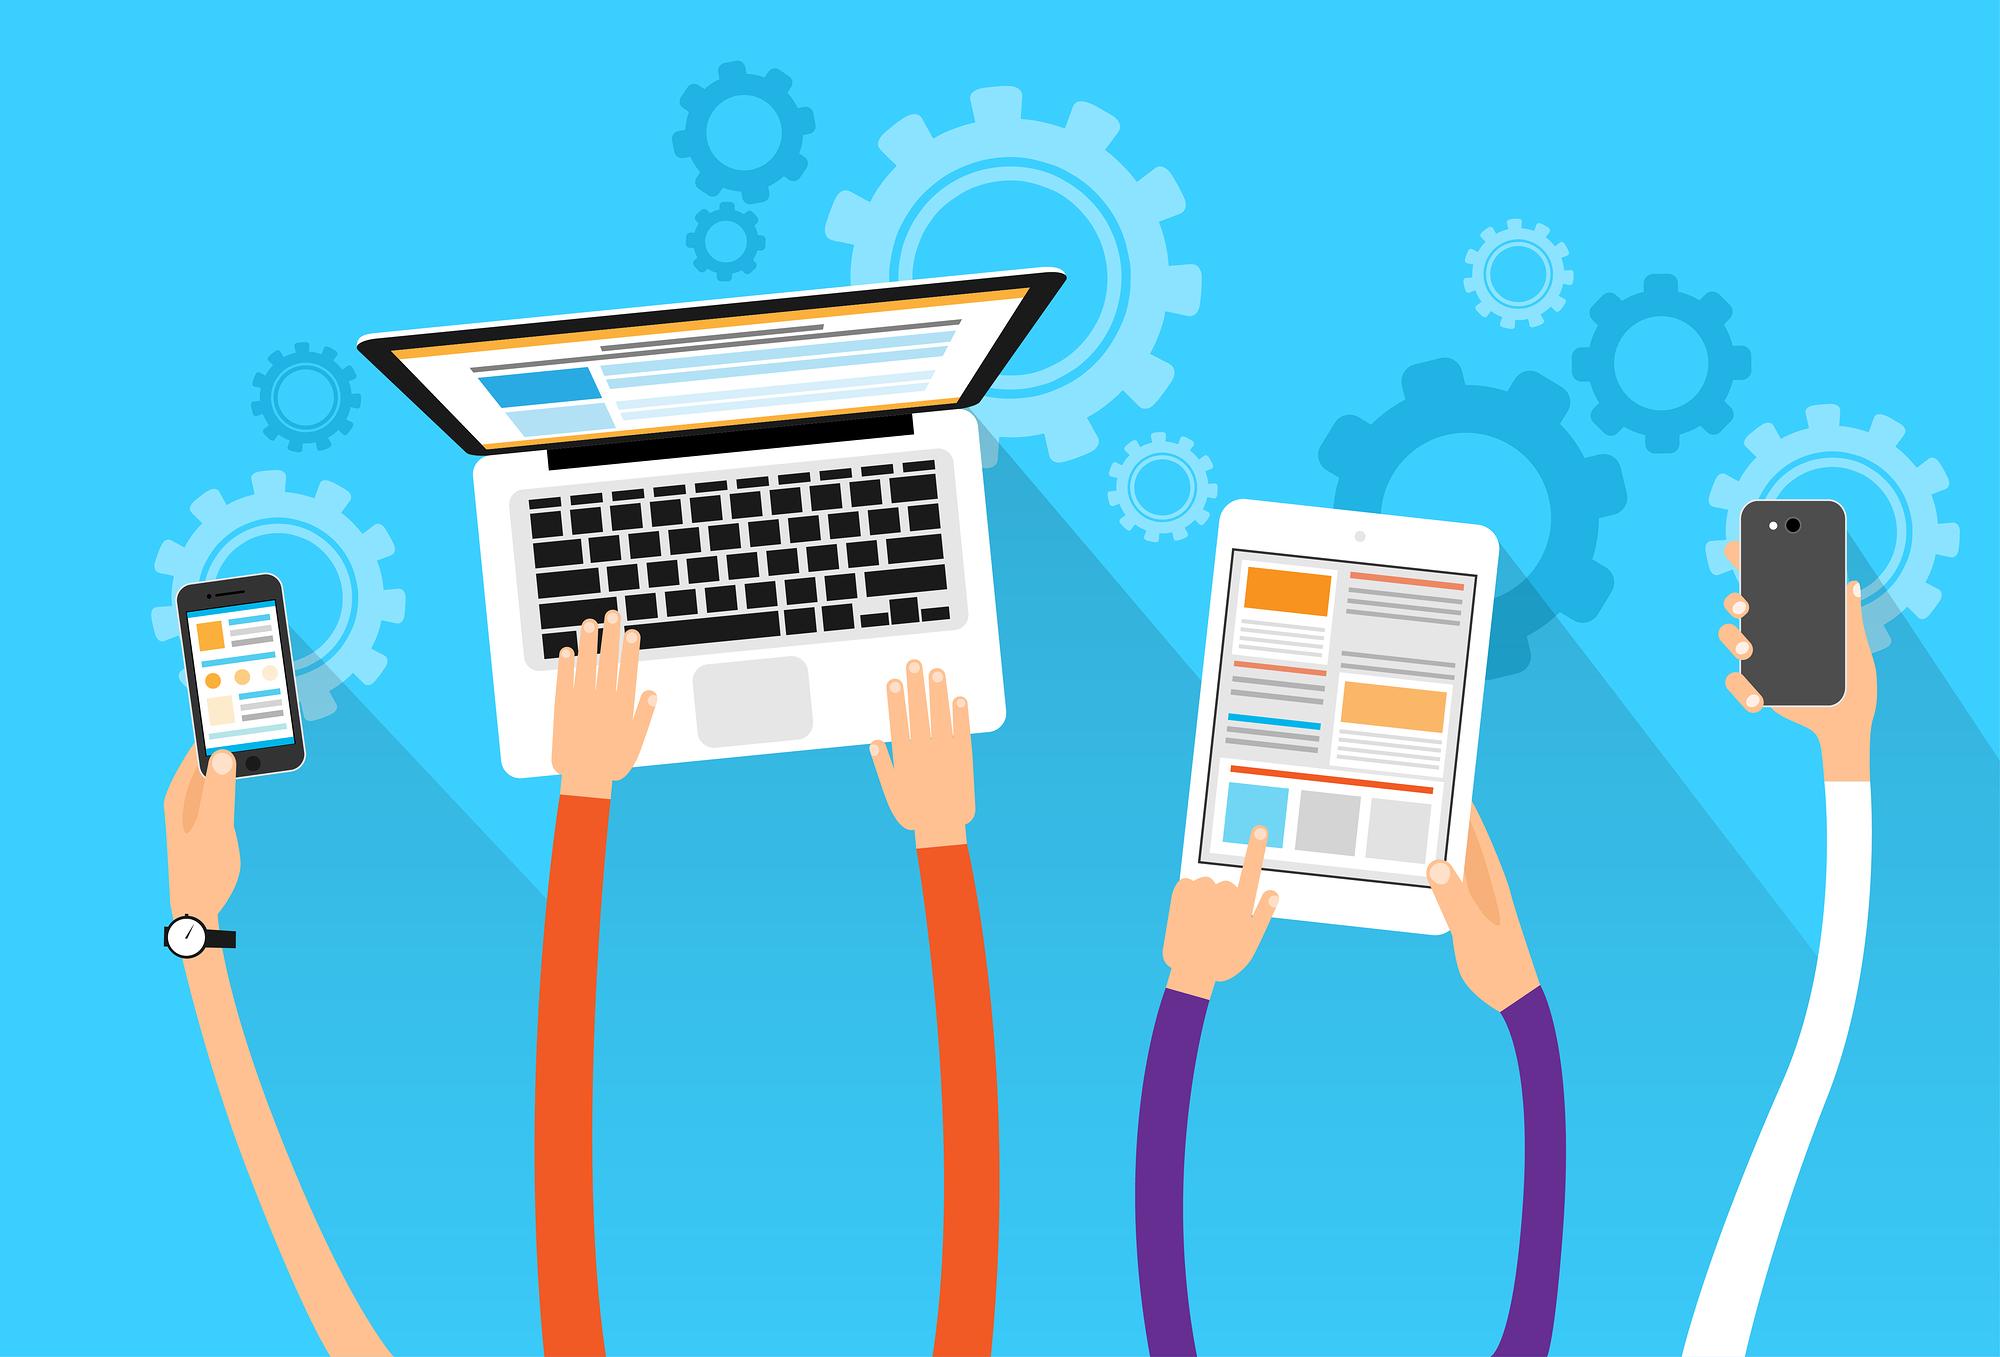 Tablet, Laptop, Mobile Phone, Digital Marketing